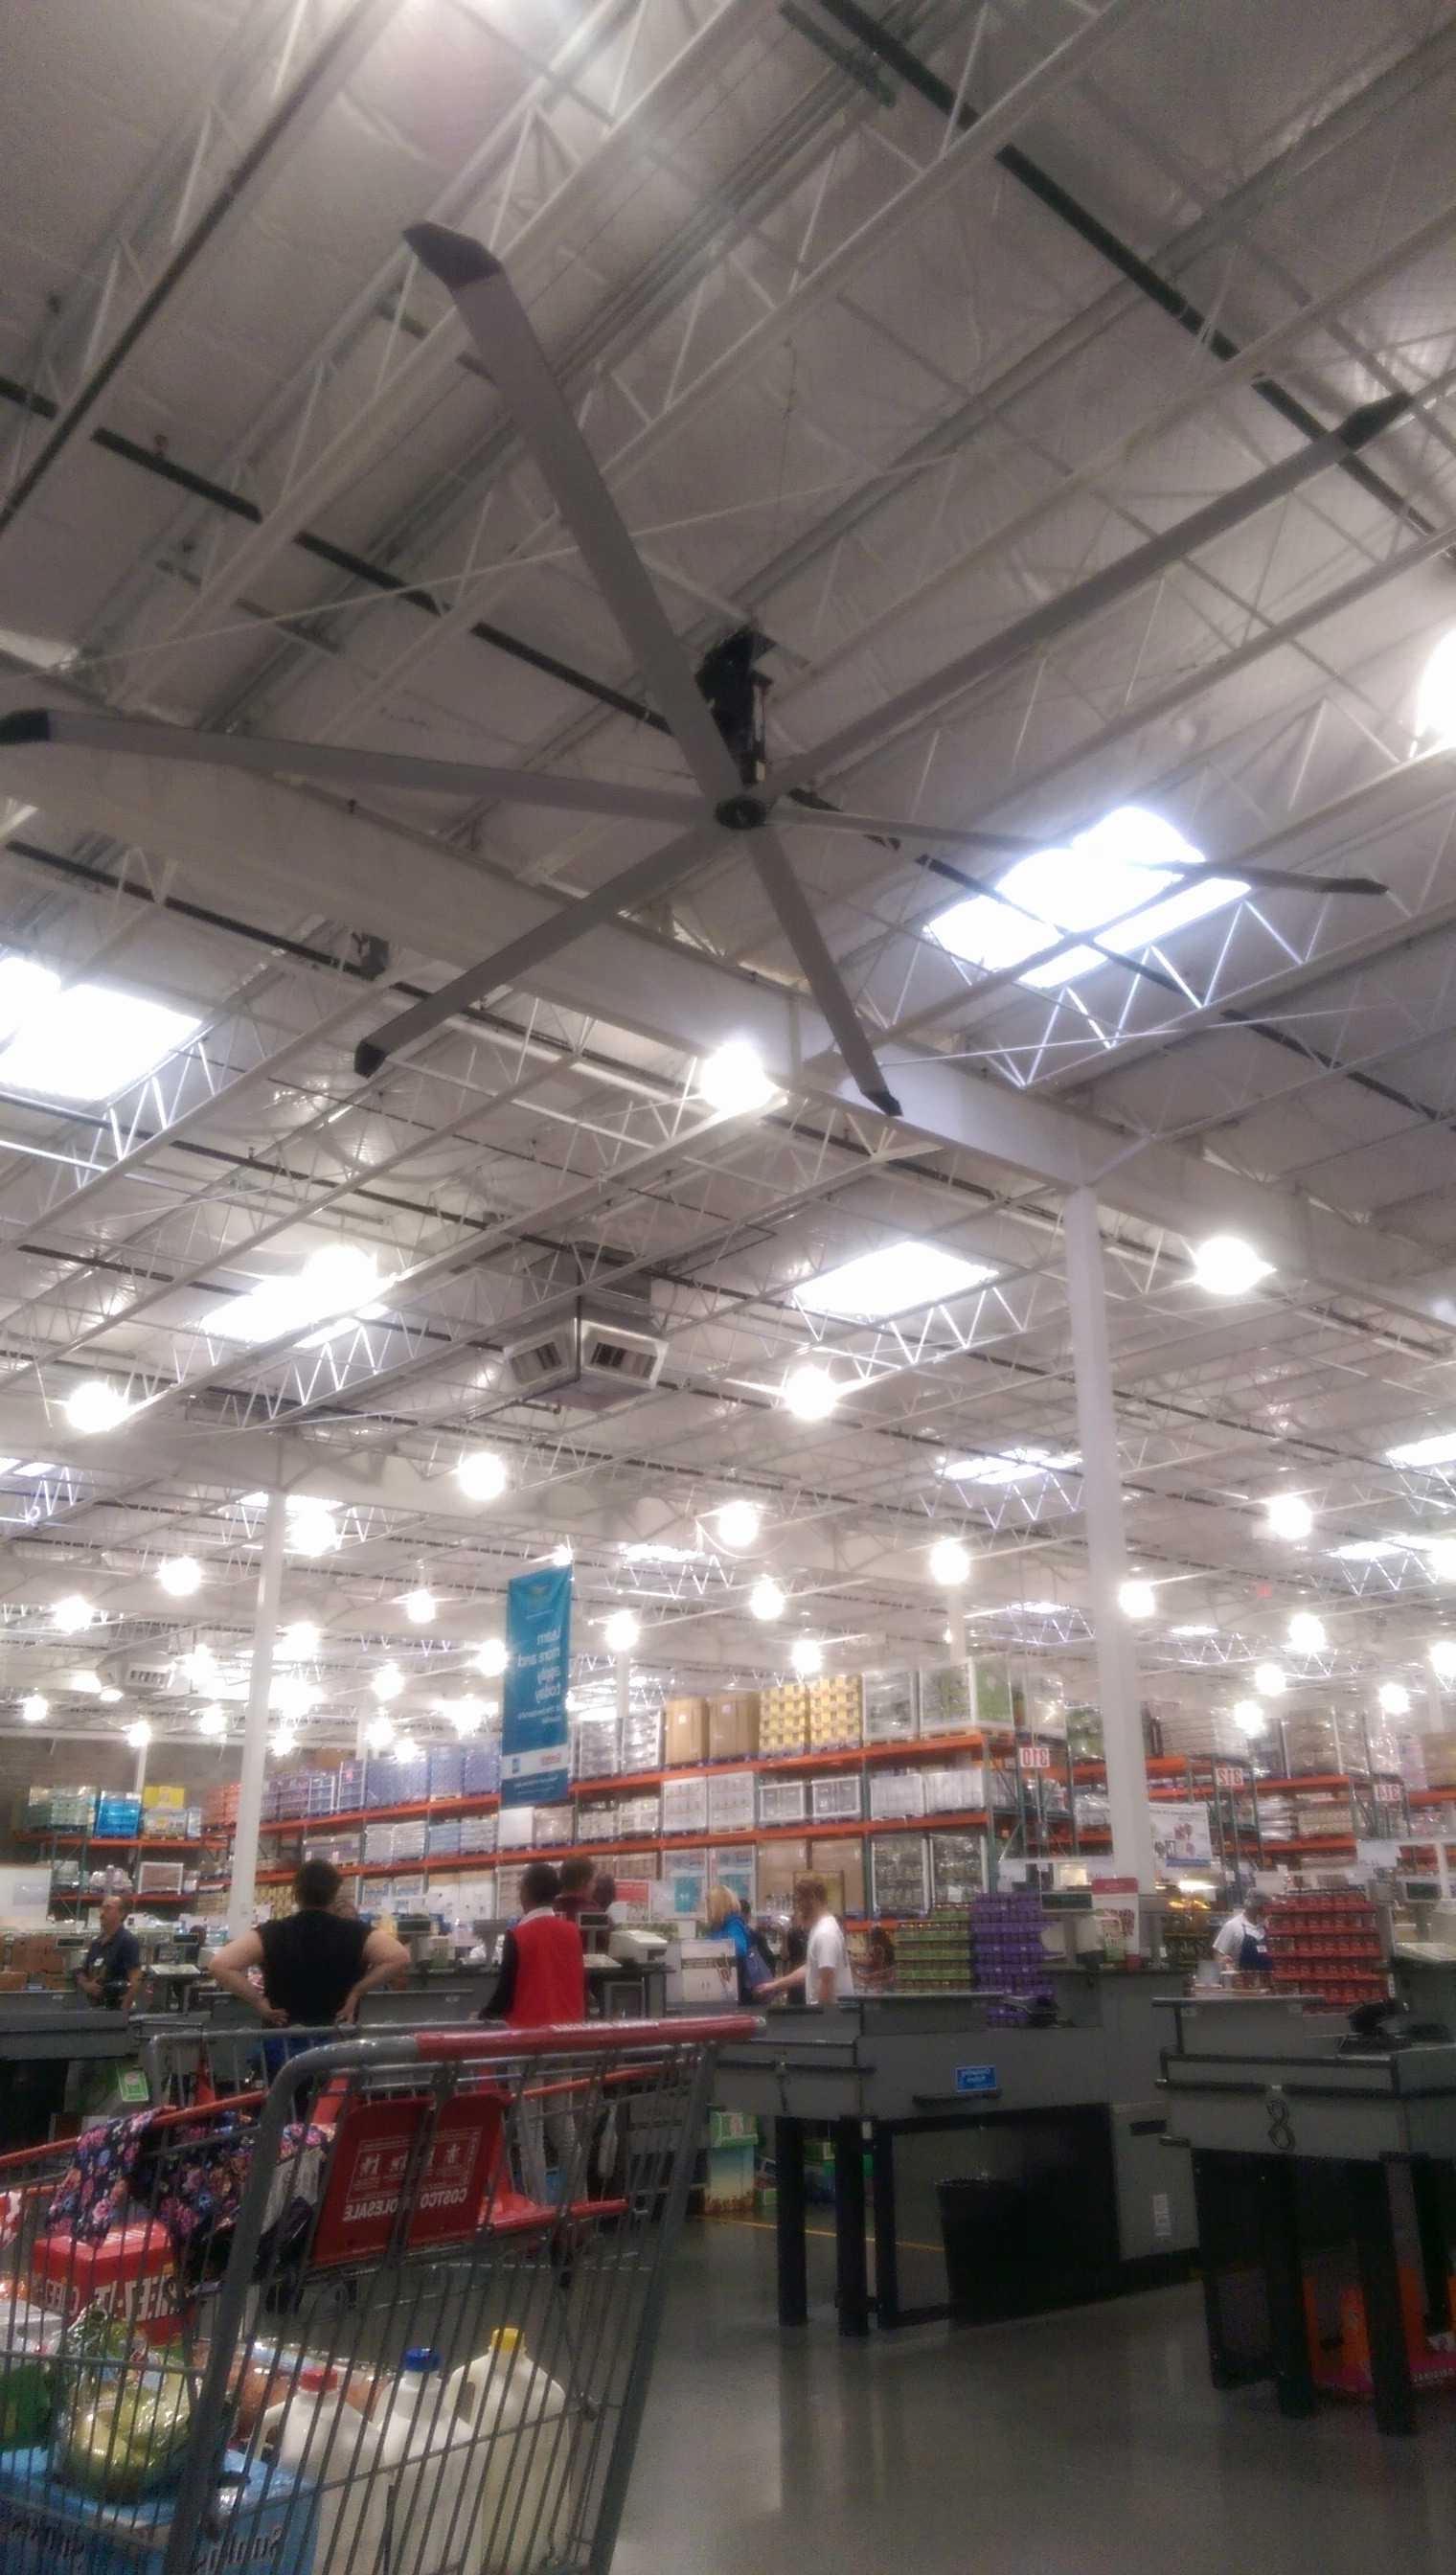 Ceiling Fans At Costco – Pranksenders Regarding Famous Outdoor Ceiling Fans At Costco (View 16 of 20)